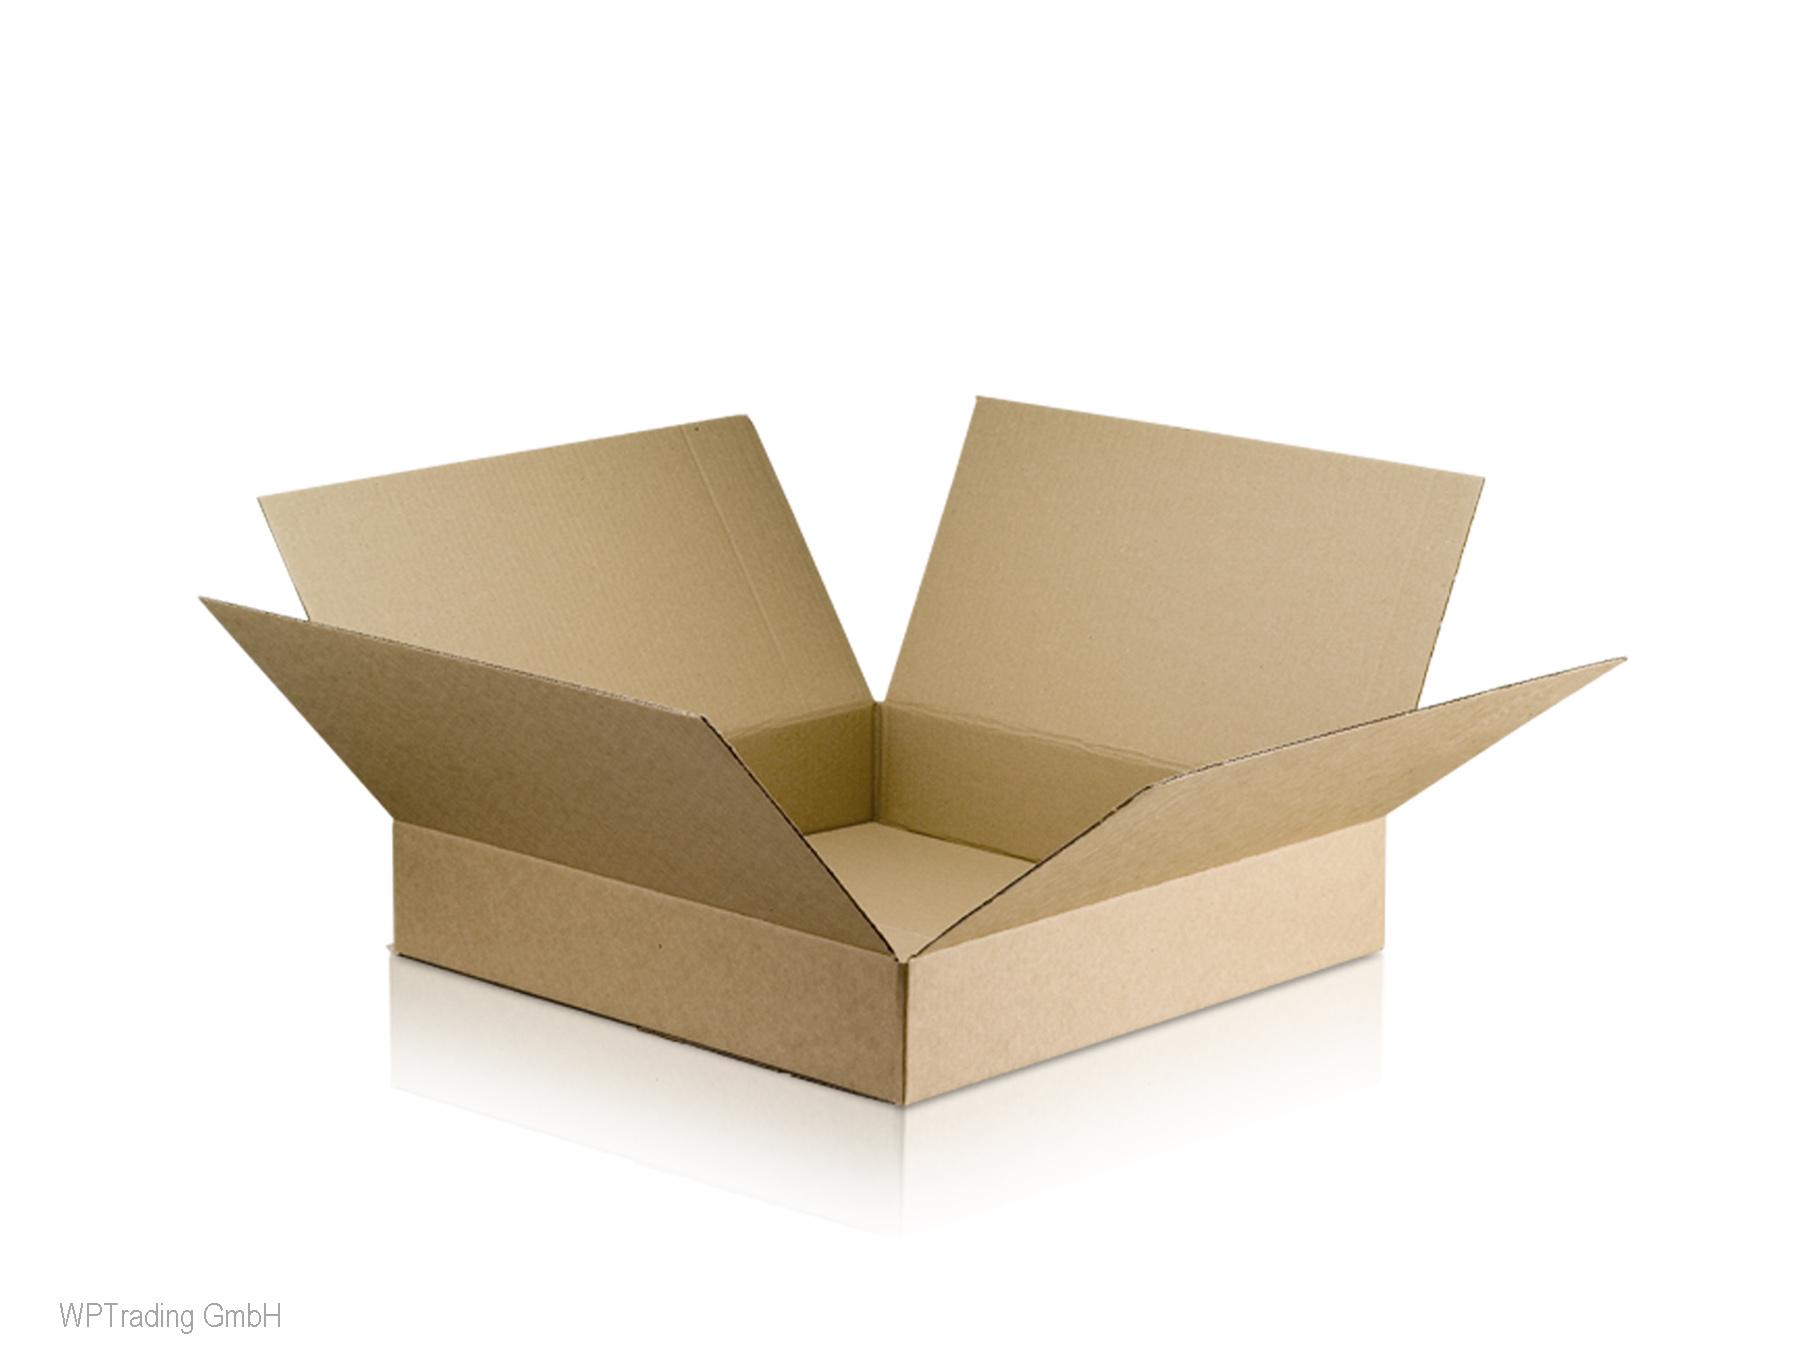 Kartons  260 x 220 x 100 mm 100 Faltkartons